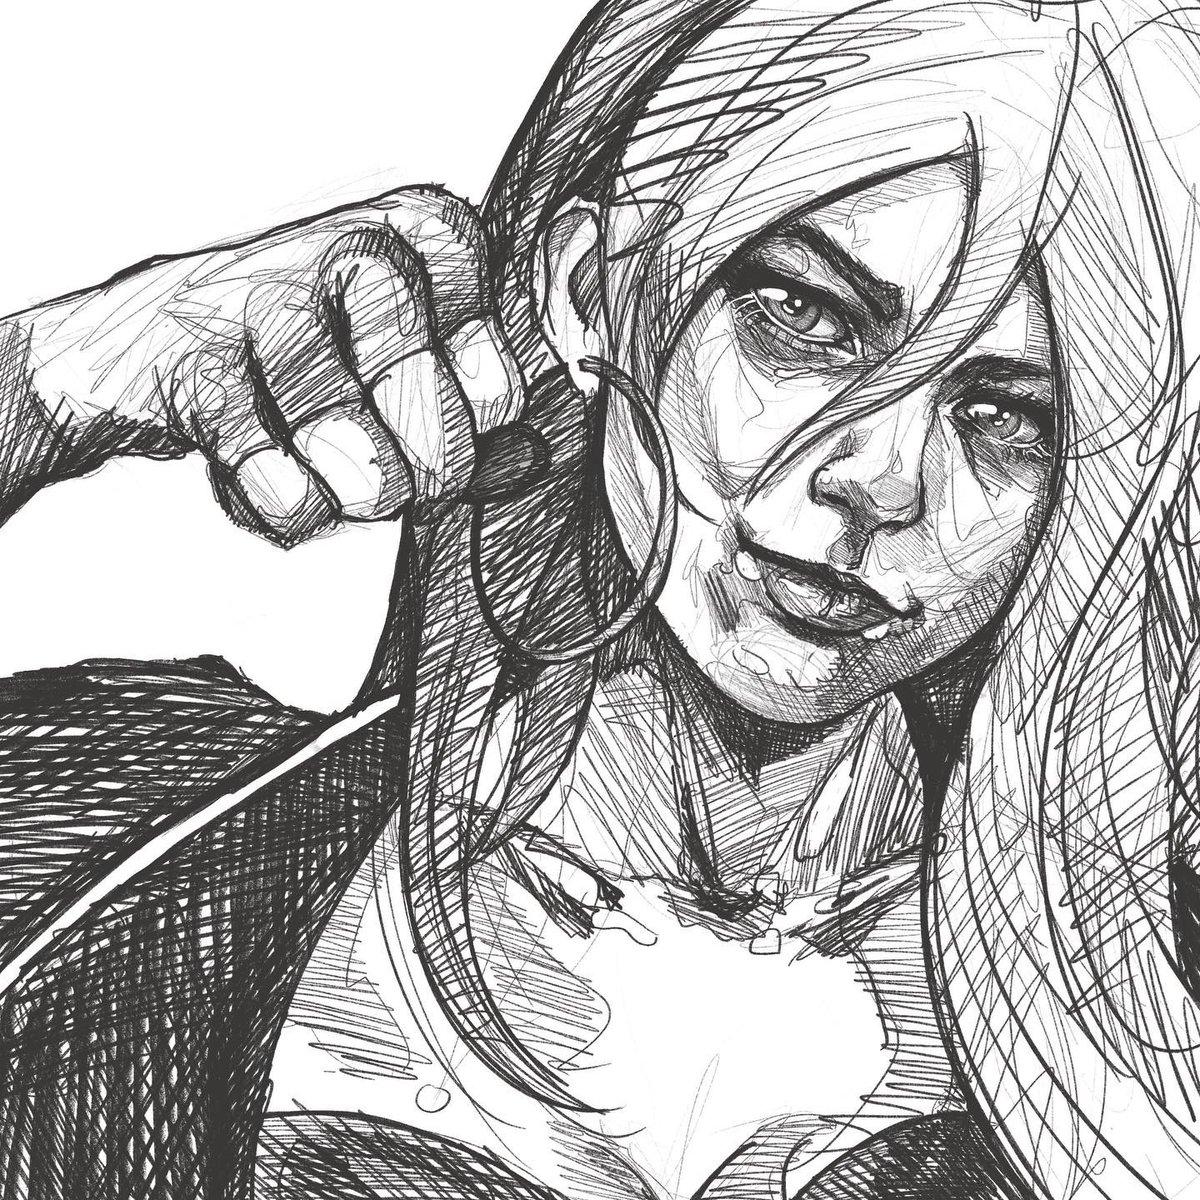 The Female Brawler. . #streetsofrage #sega #brawl #beatemup #blazefielding #playstation #platform #fanart #videogame #monochrome #warrior #streets #lineart #doodle #fist #fight #streetsofrage4 #yuzokoshiro  #sketch #procreate #digitalart #ipad #art_spotlight #arcade #girlpowerpic.twitter.com/ThIsXtEPzp